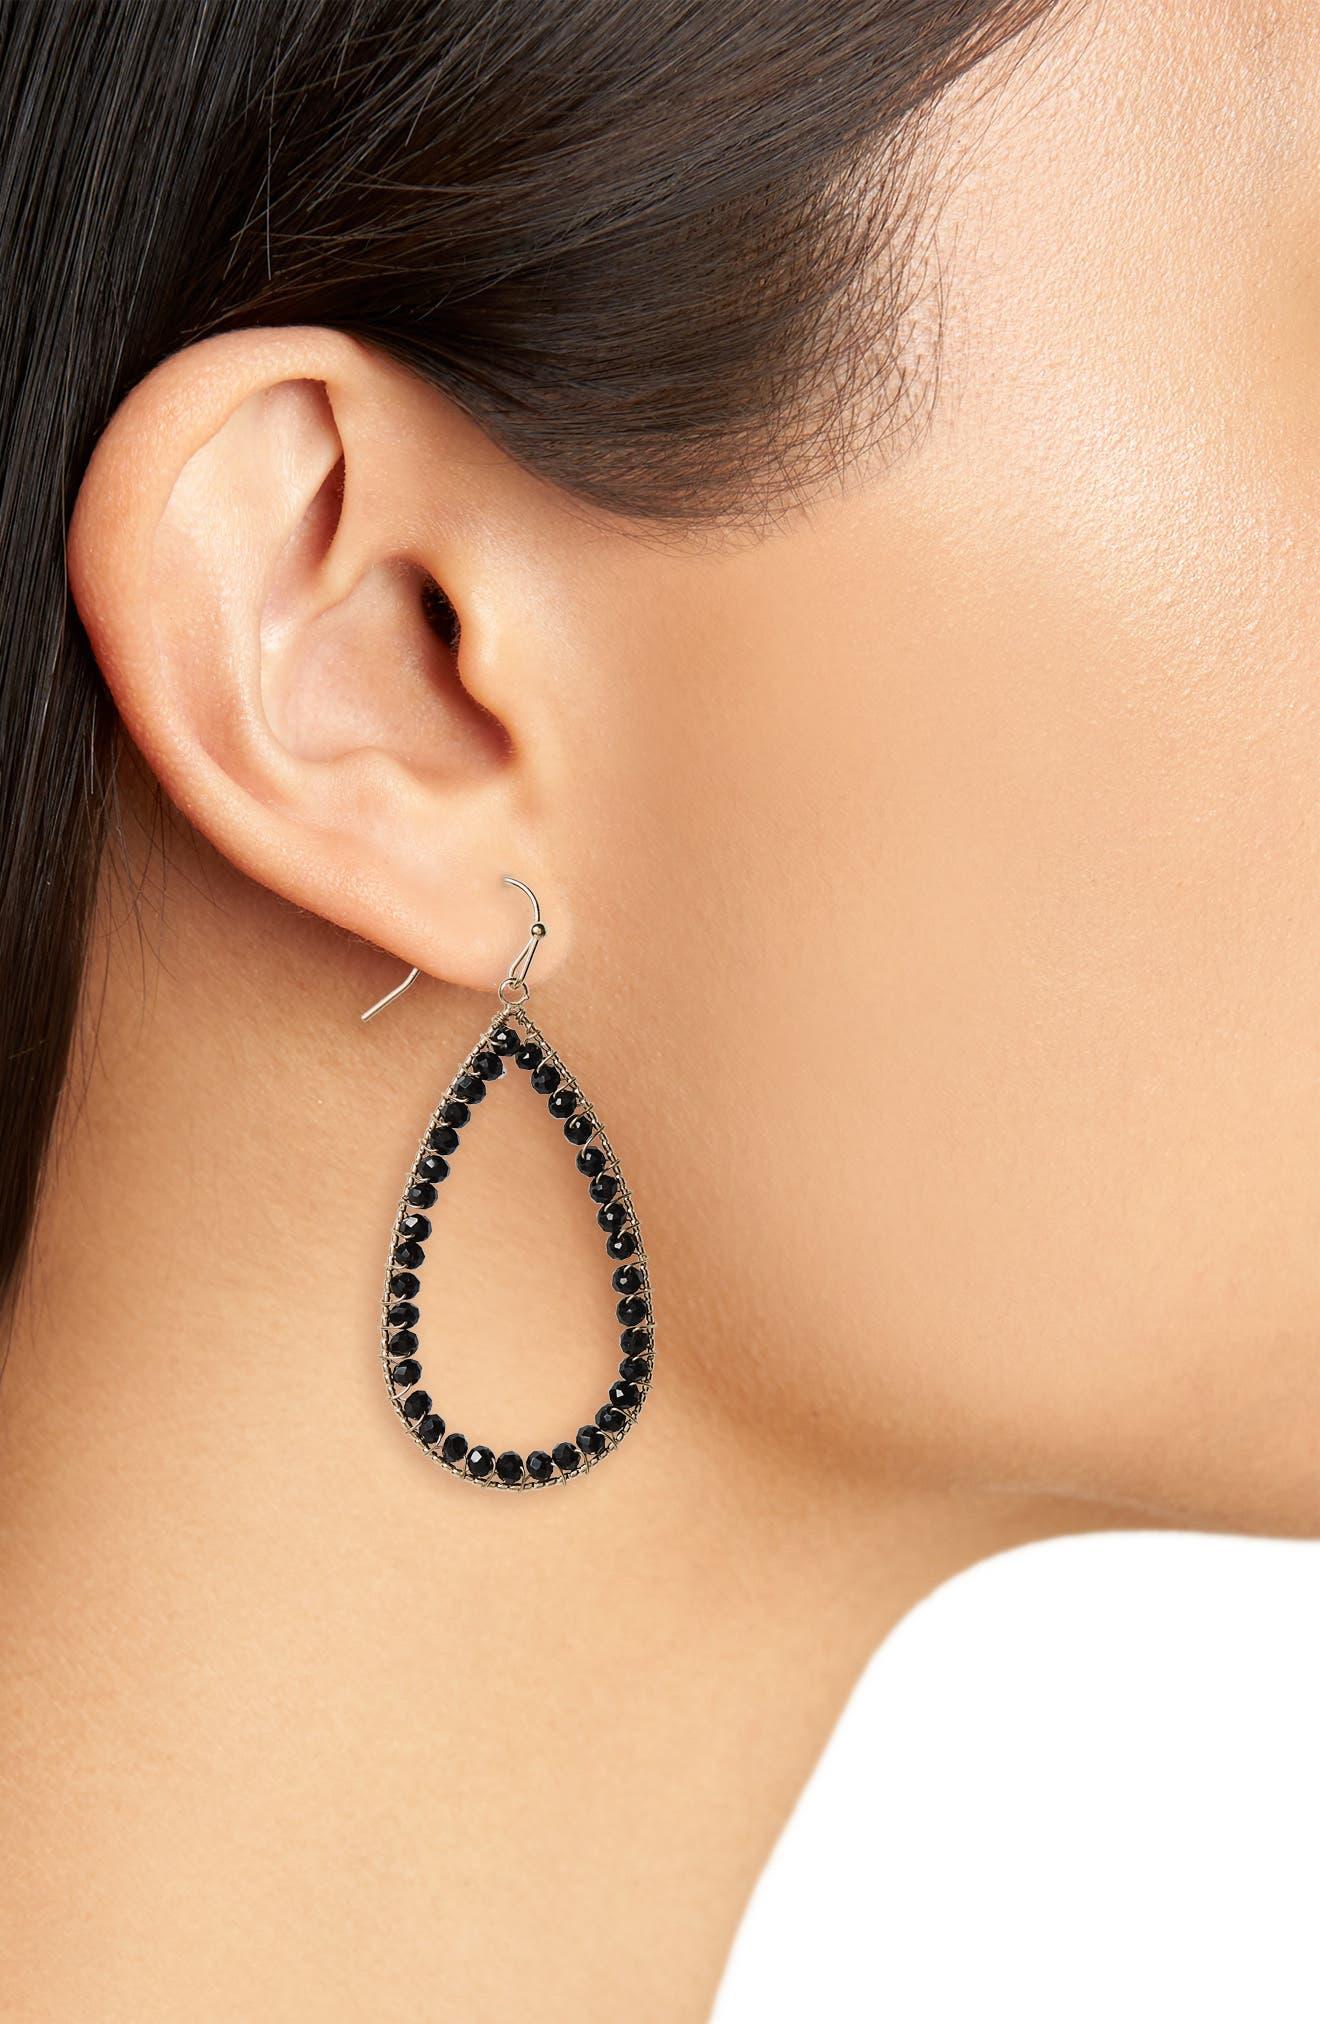 Teardrop Earrings,                             Alternate thumbnail 2, color,                             001